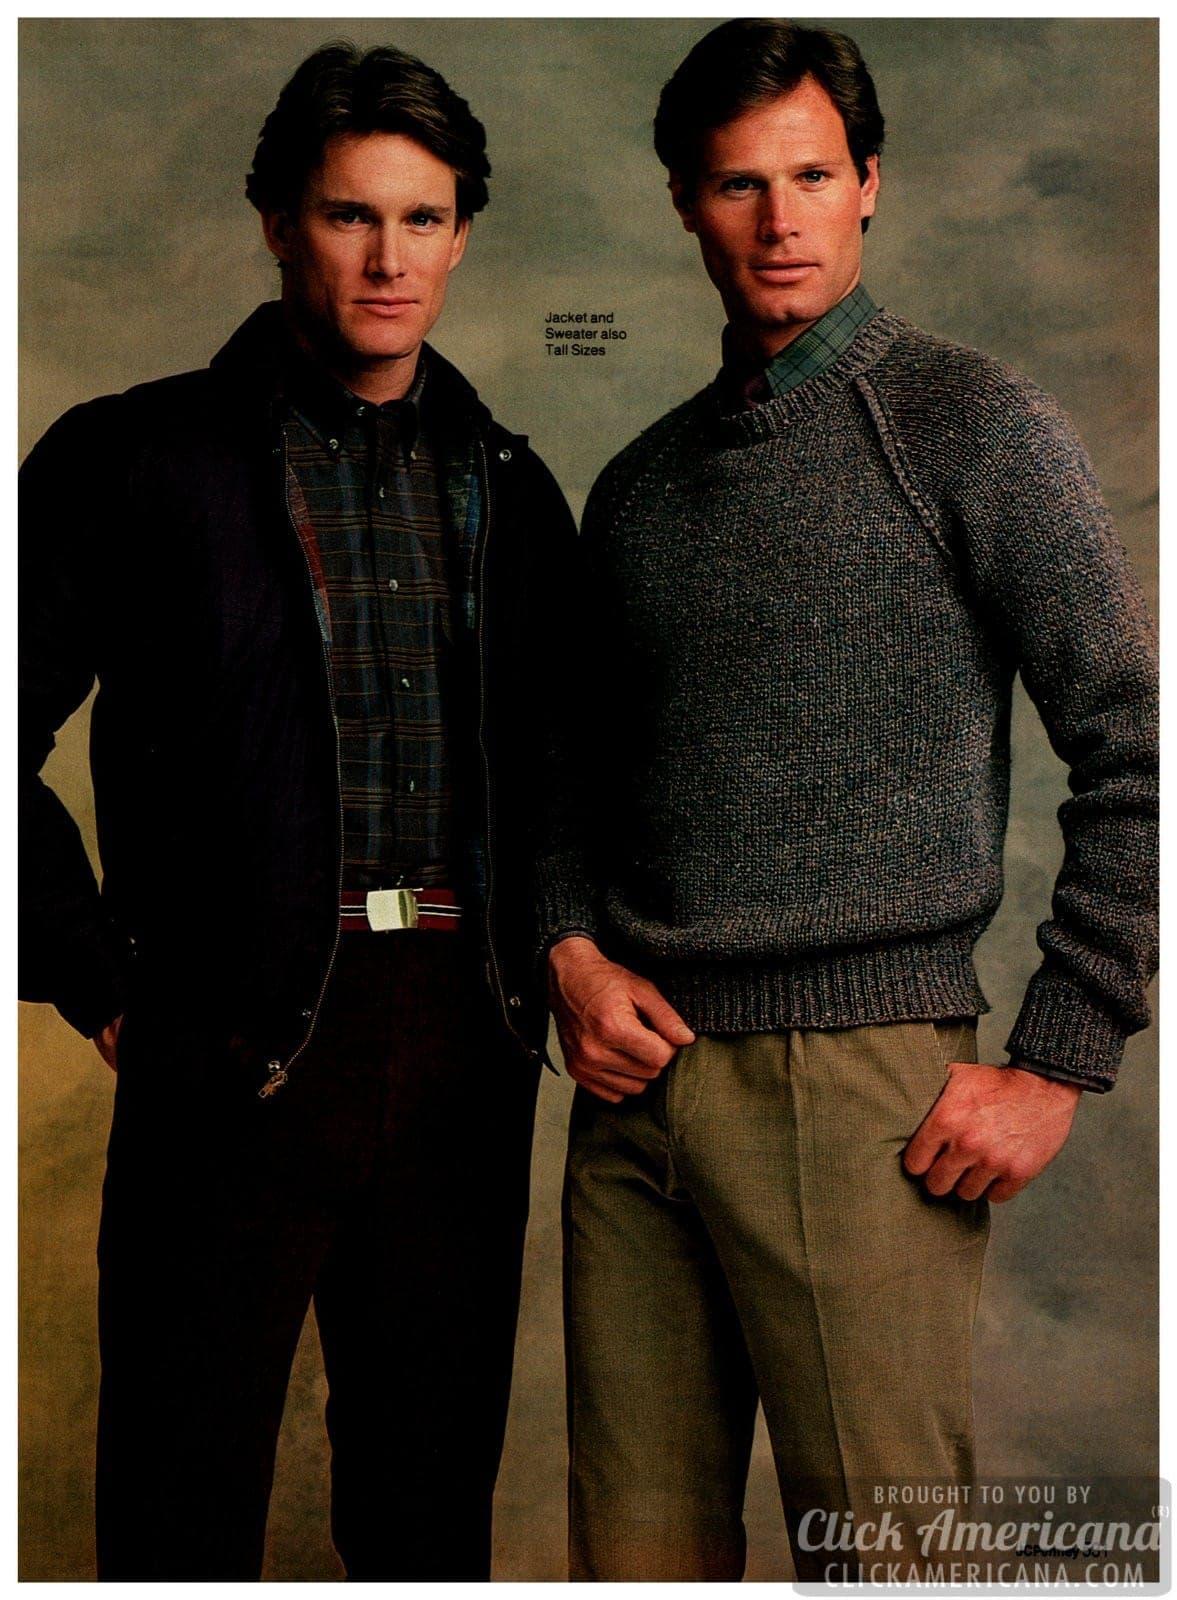 Tweed slacks, plaid shirts, khaki pants, corduroy slacks (cords) and webbed cotton belts for guys